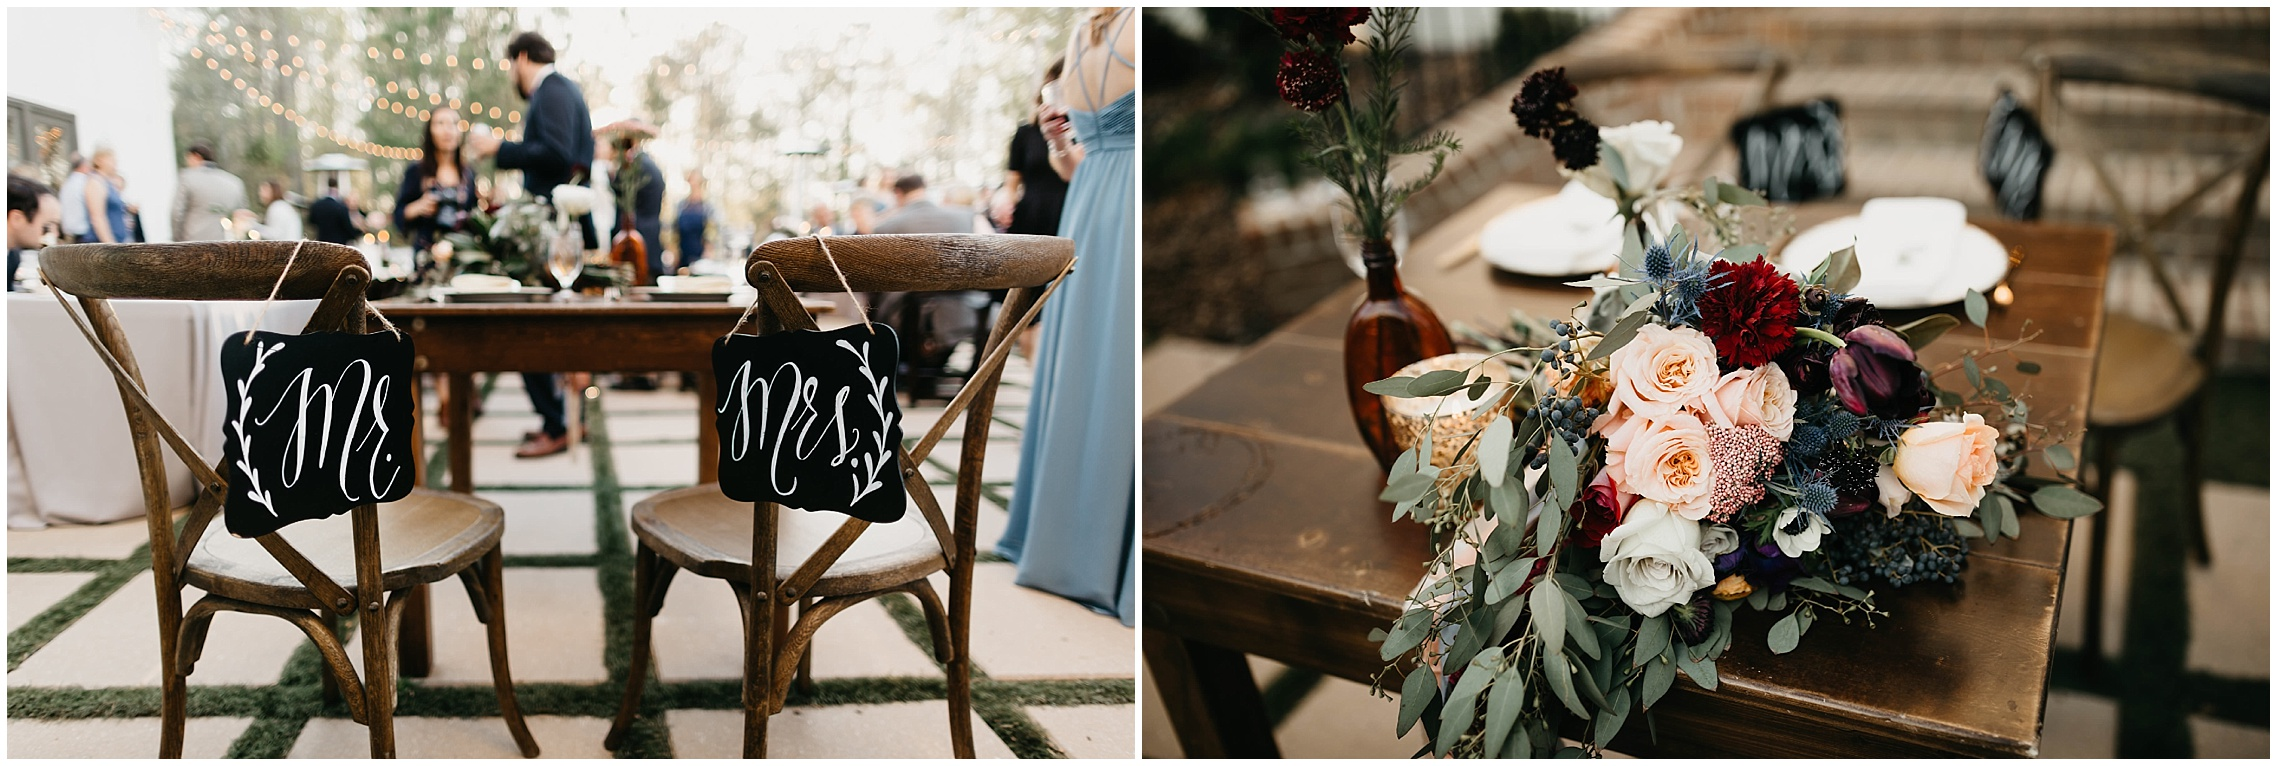 estes_park_wedding_colorado_photographer_0129.jpg